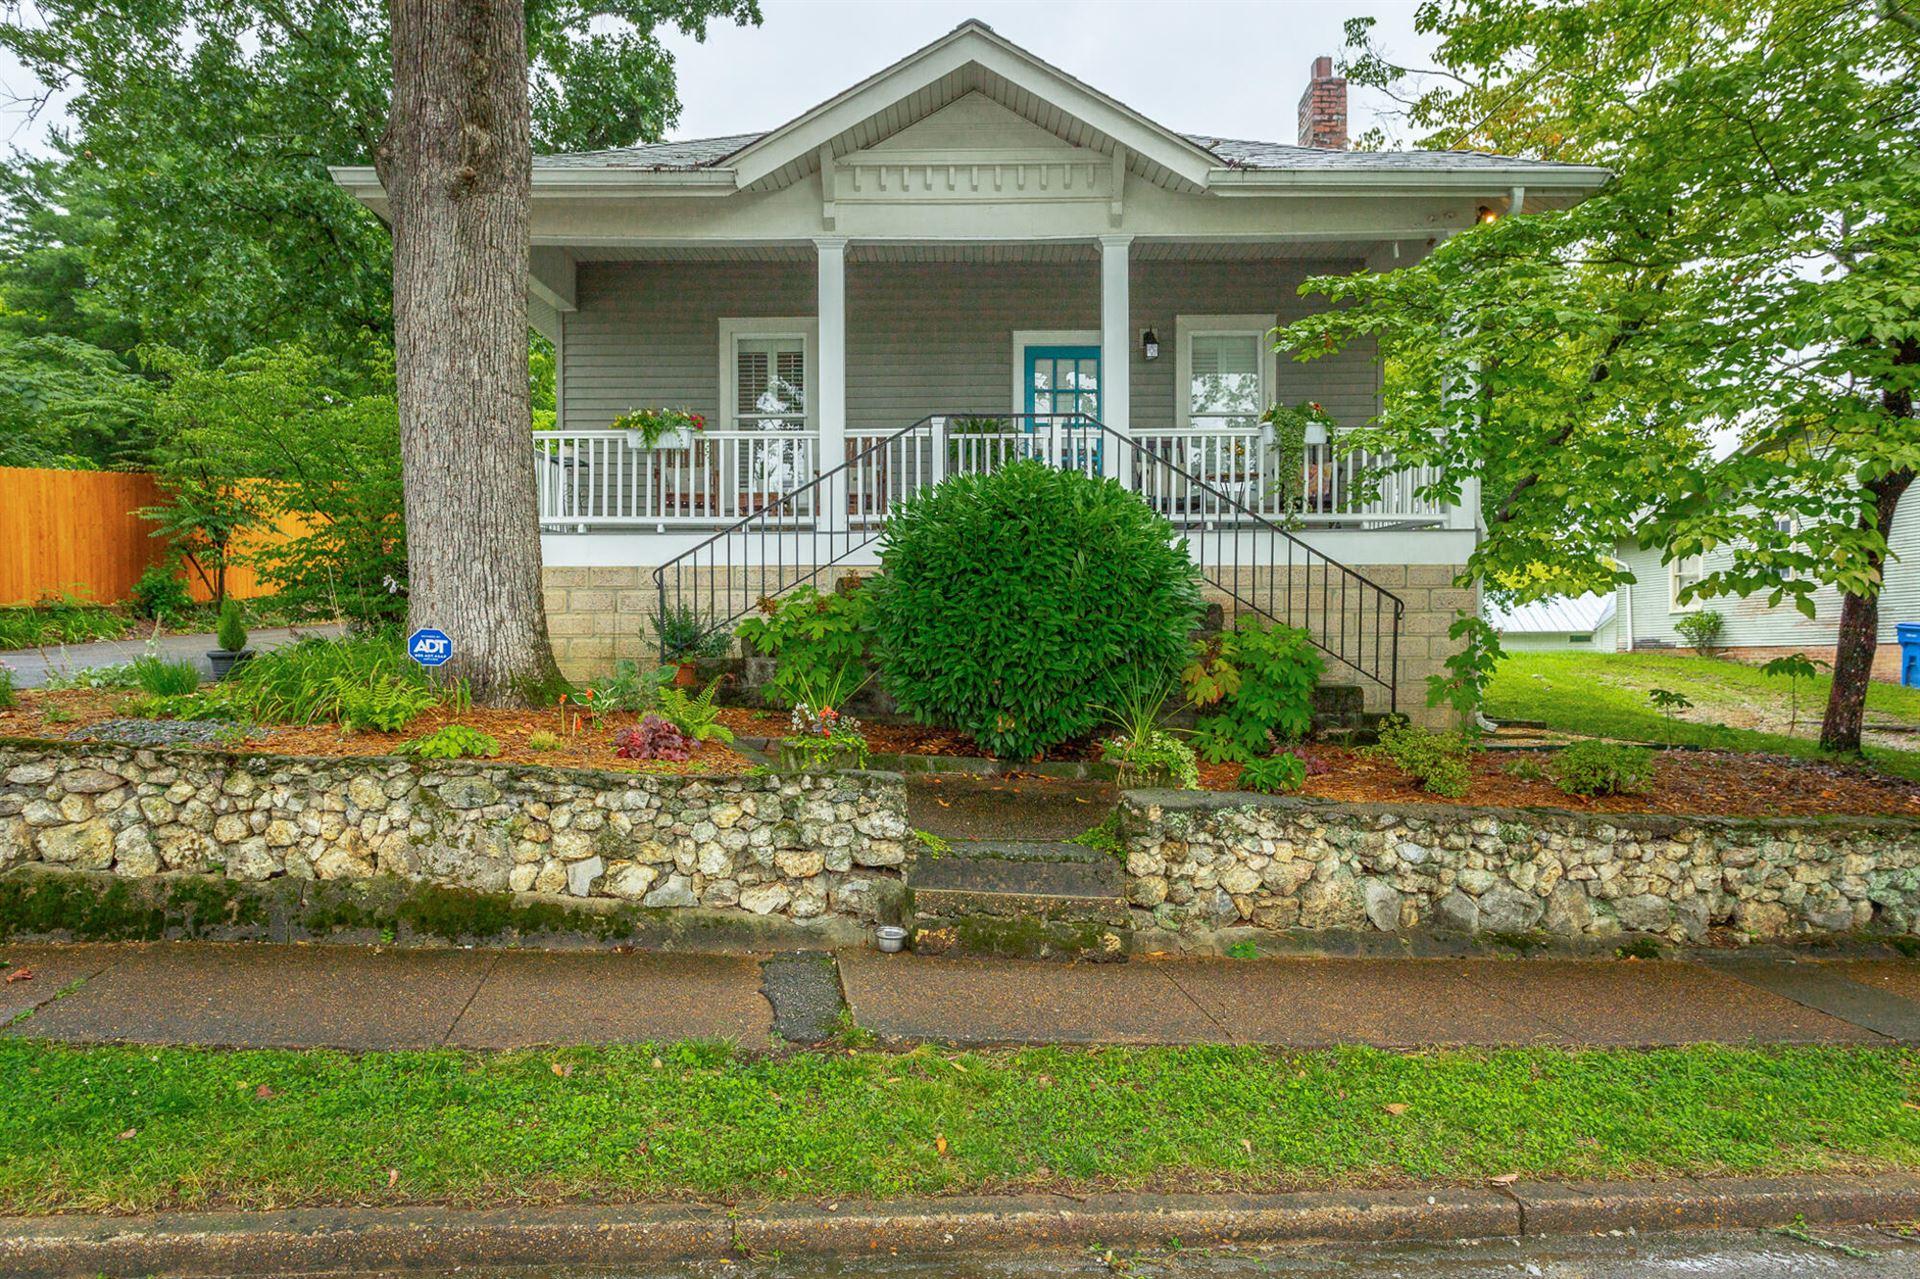 705 Elinor St, Chattanooga, TN 37405 - MLS#: 1339478